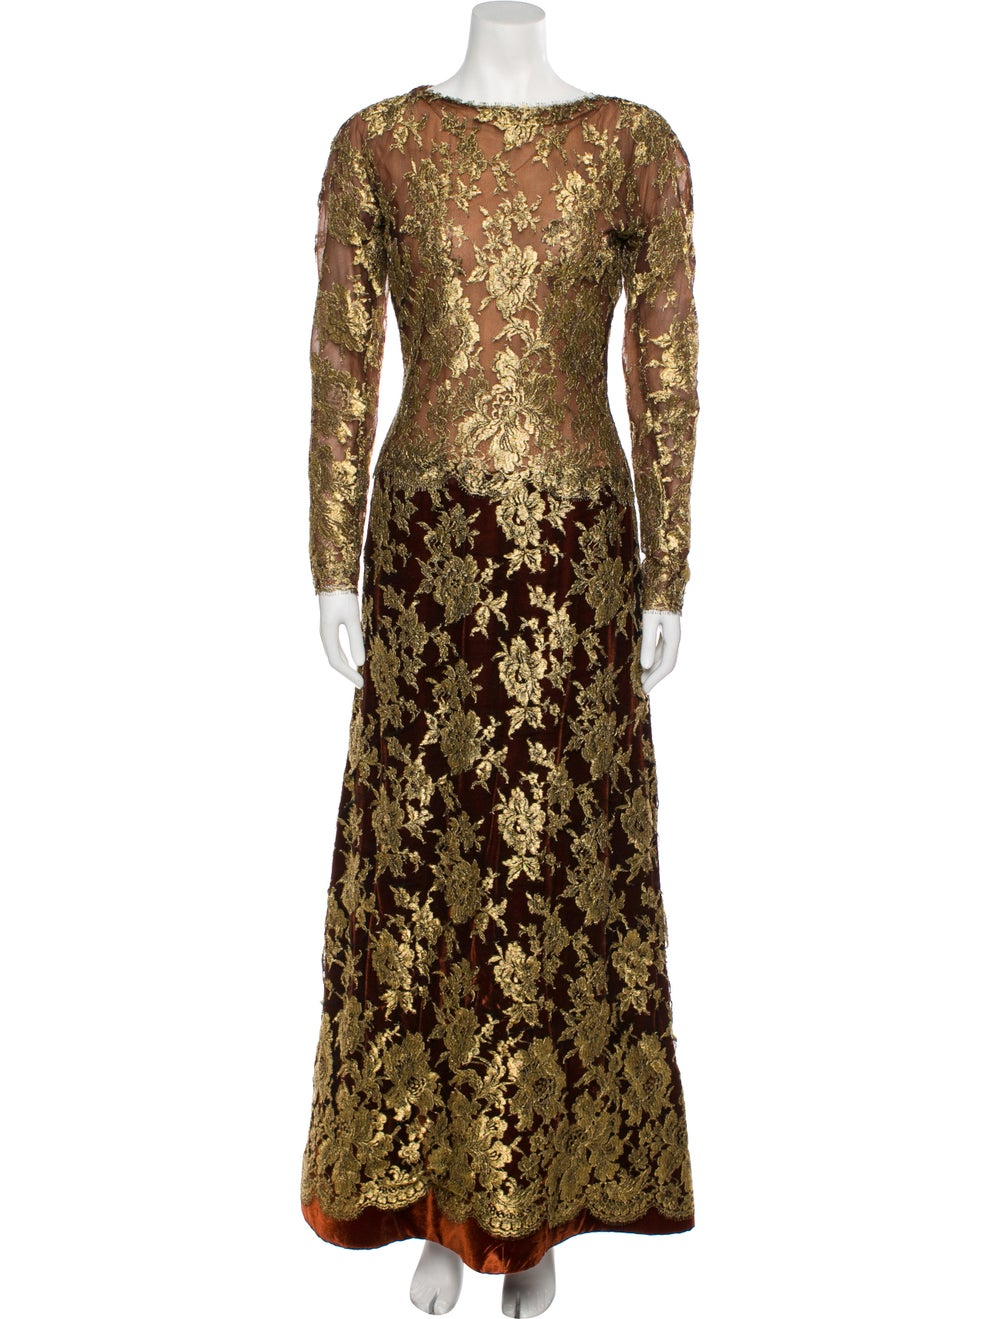 Arnold Scaasi Vintage Long Dress Gold - image 1